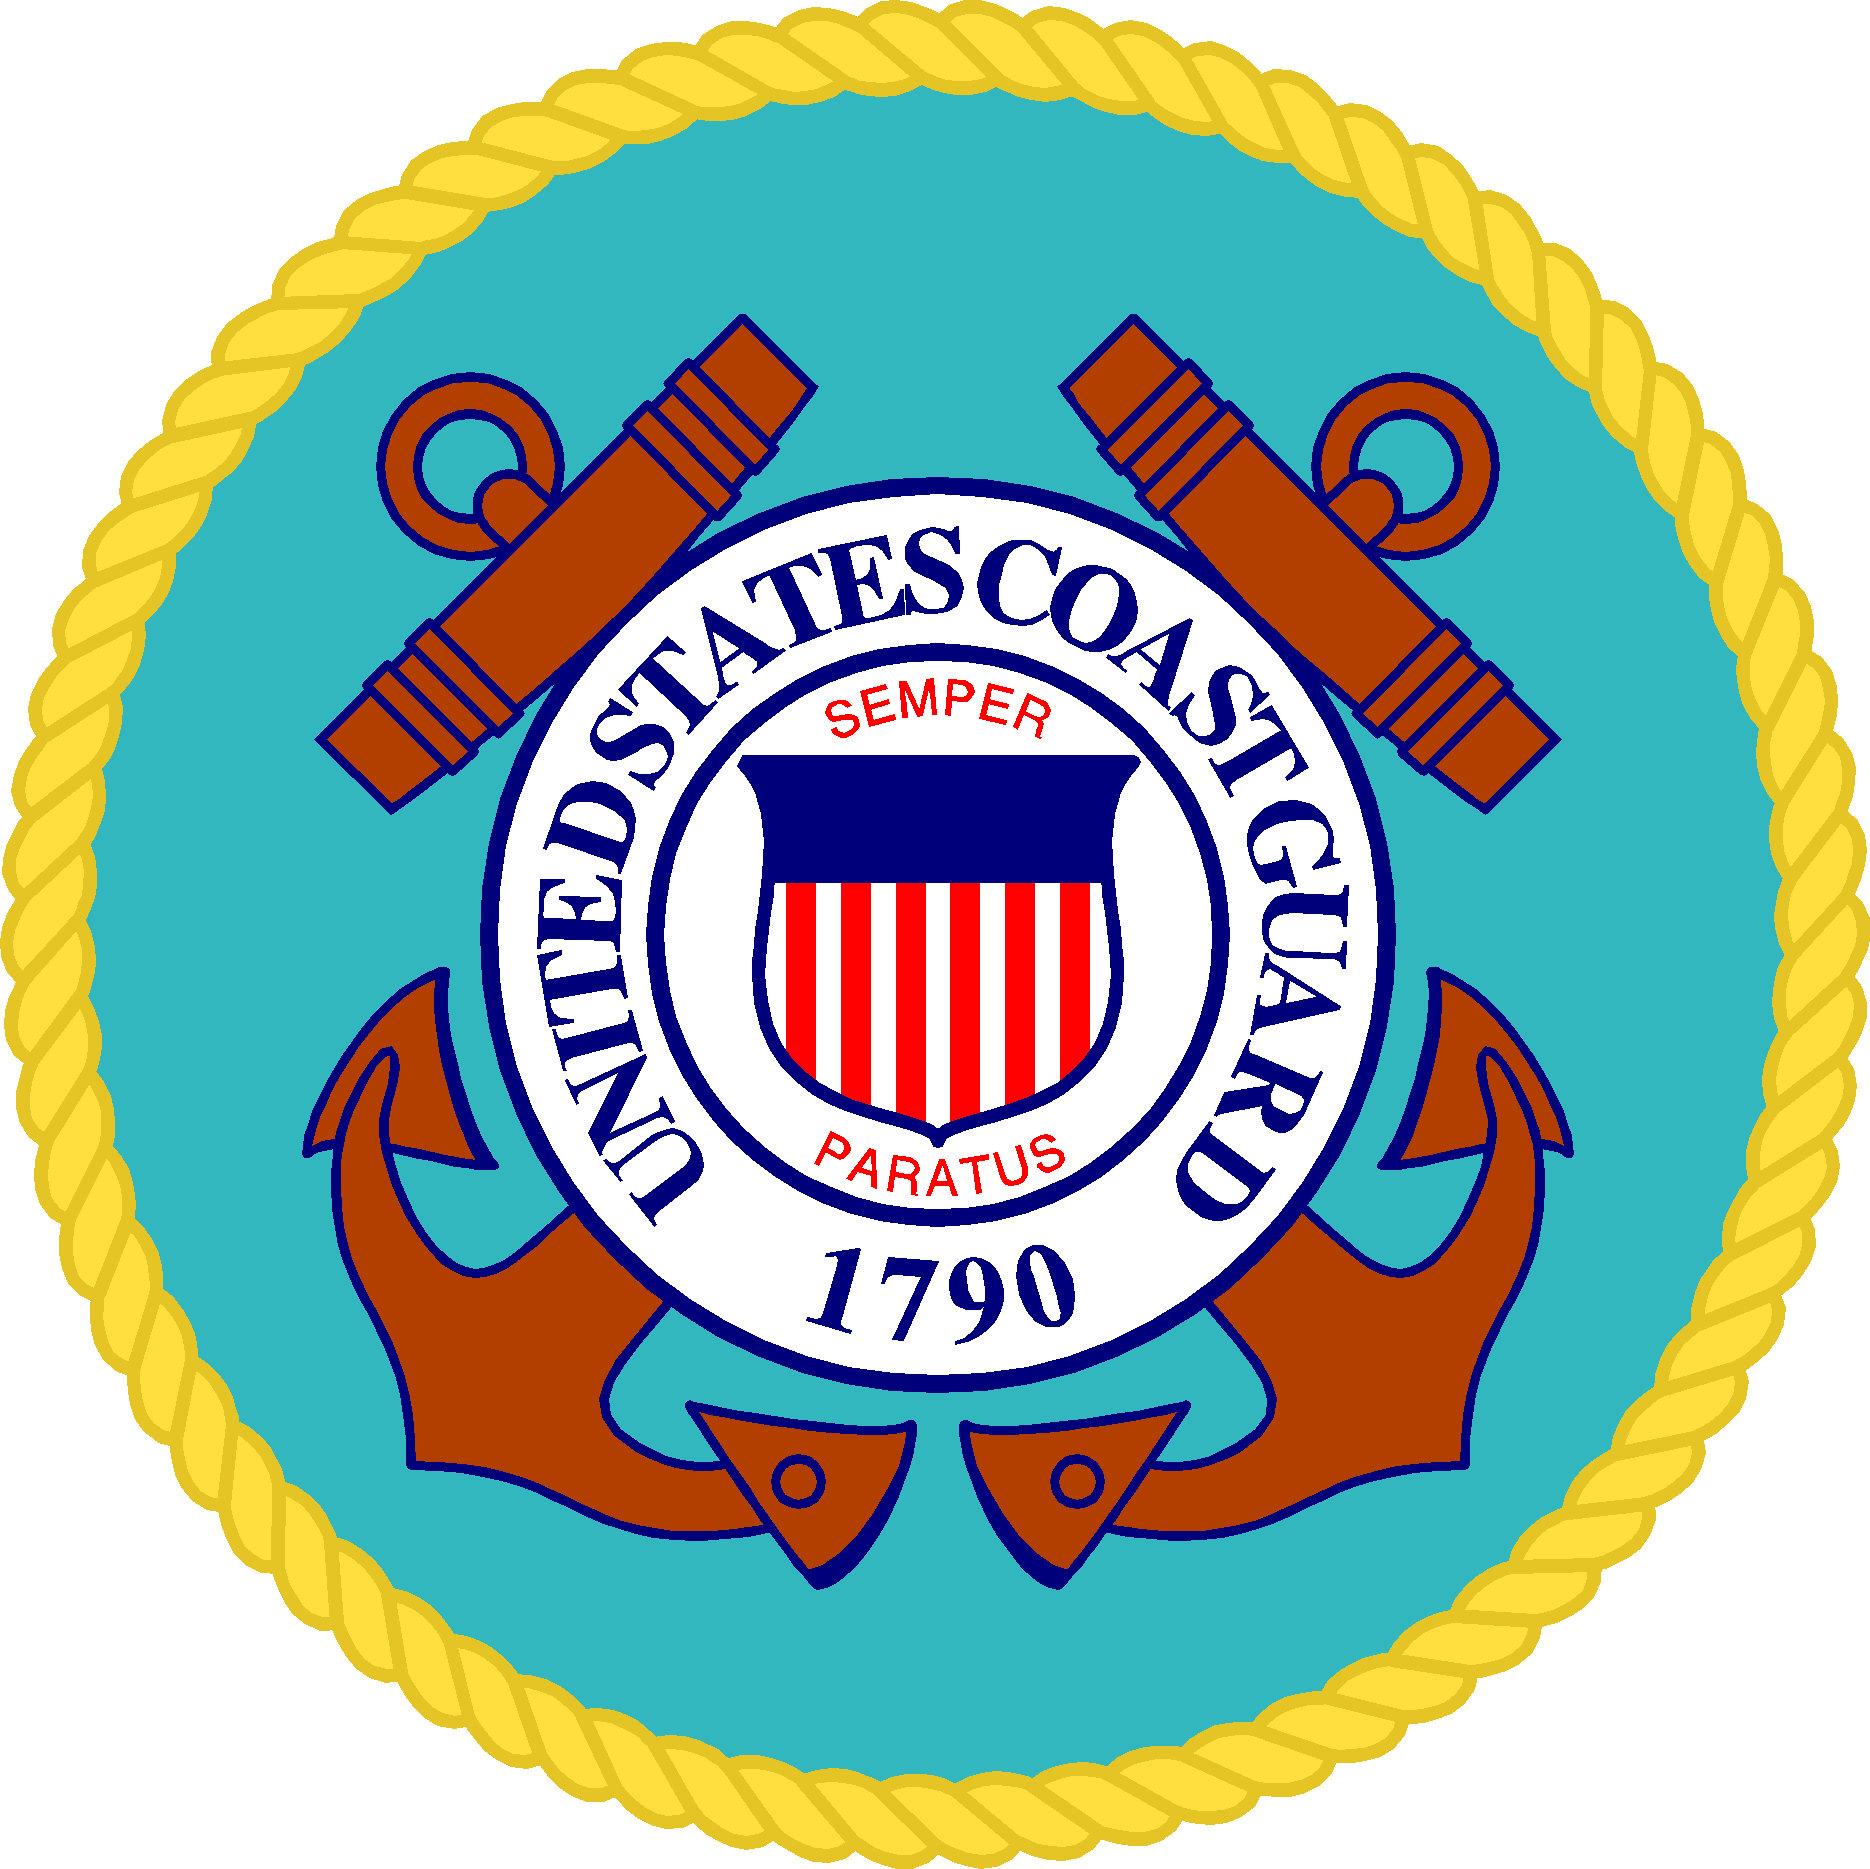 USCG Main seal